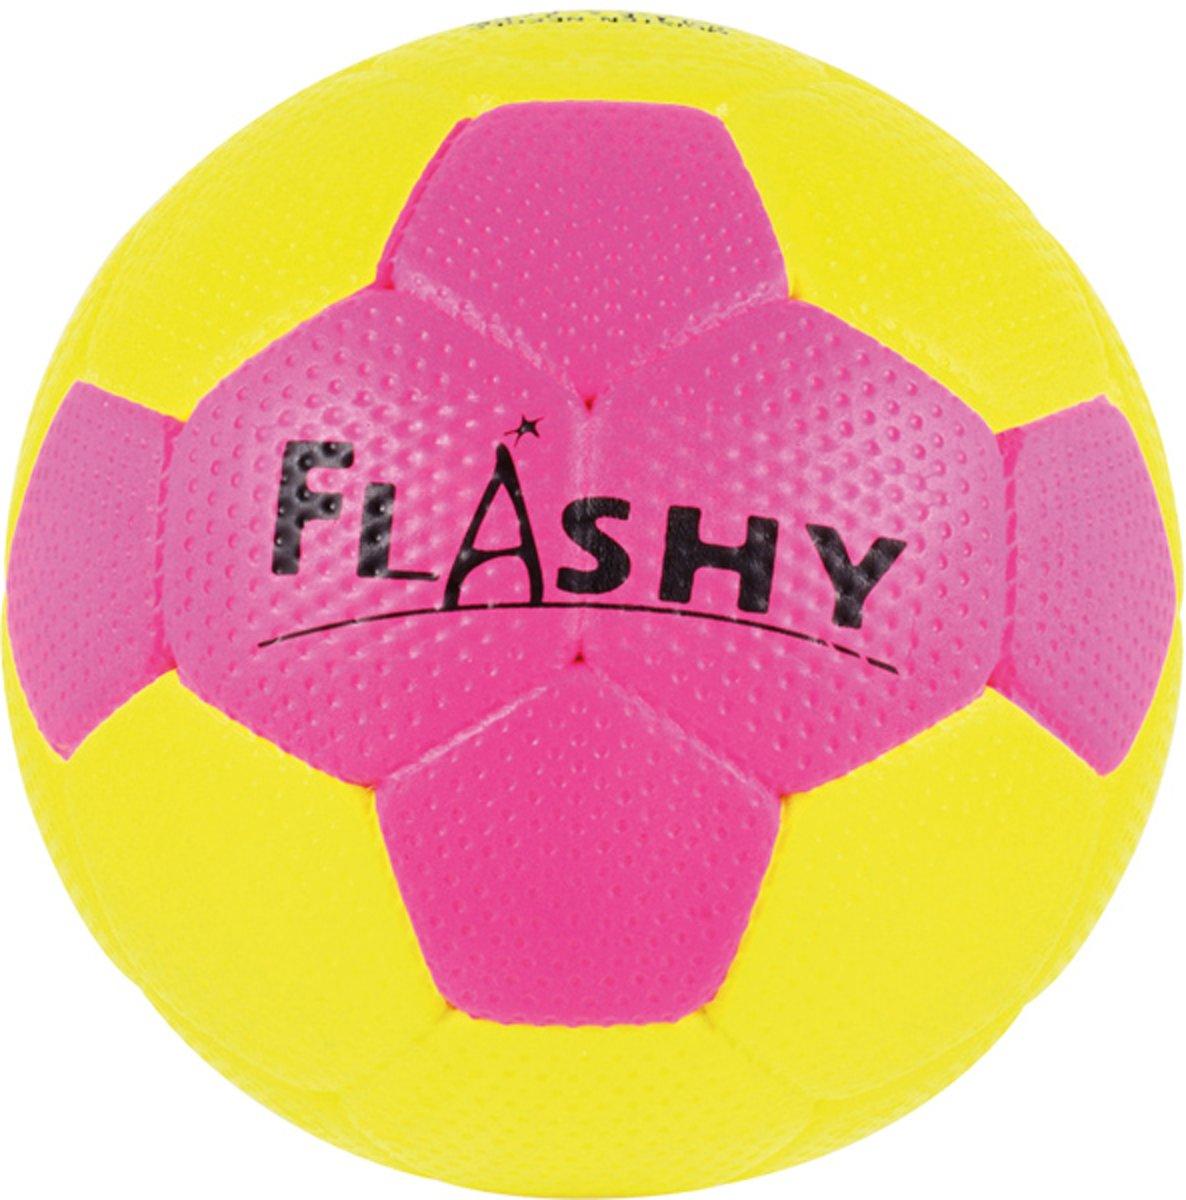 Flashy Handball kopen